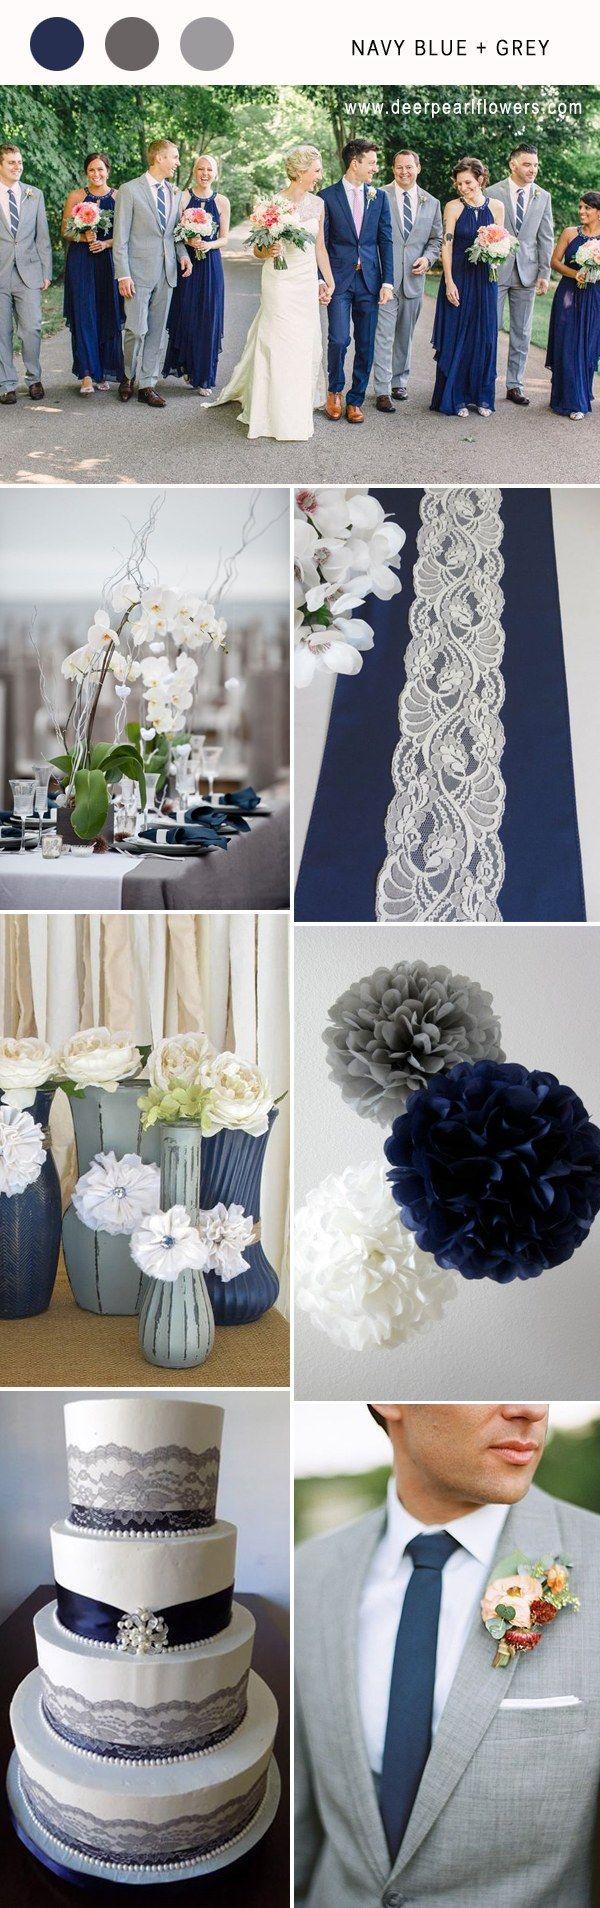 Top 10 Navy Blue Wedding Color Combo Ideas For 2018 Wedding Color